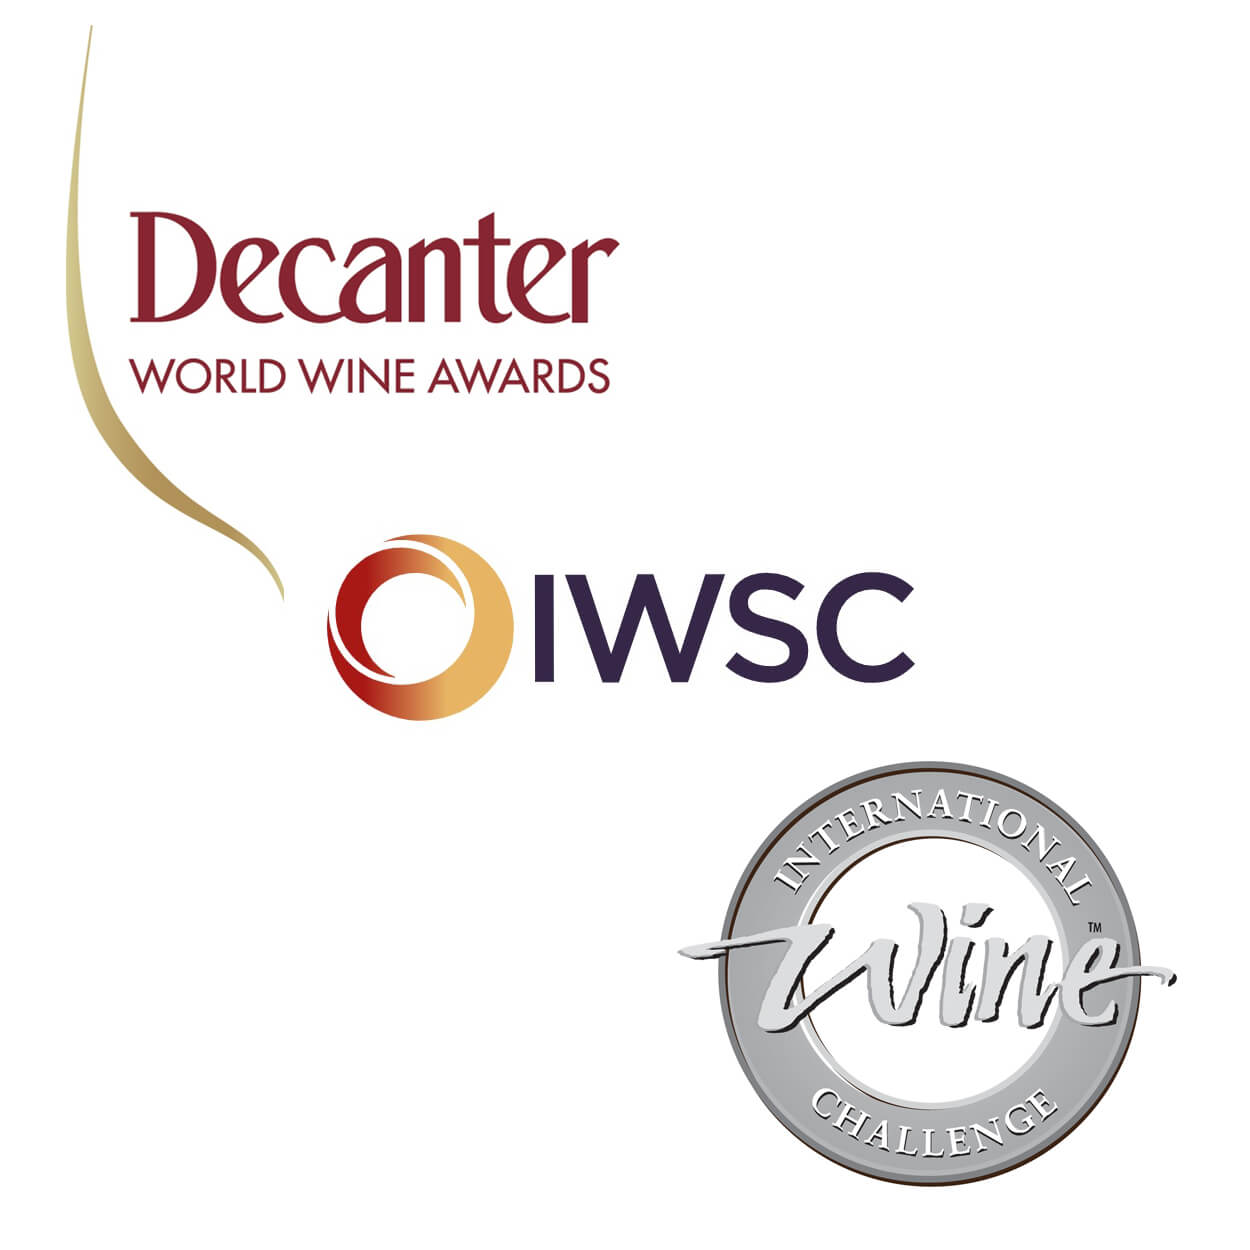 Decanter IWC IWSC logos English wine awards